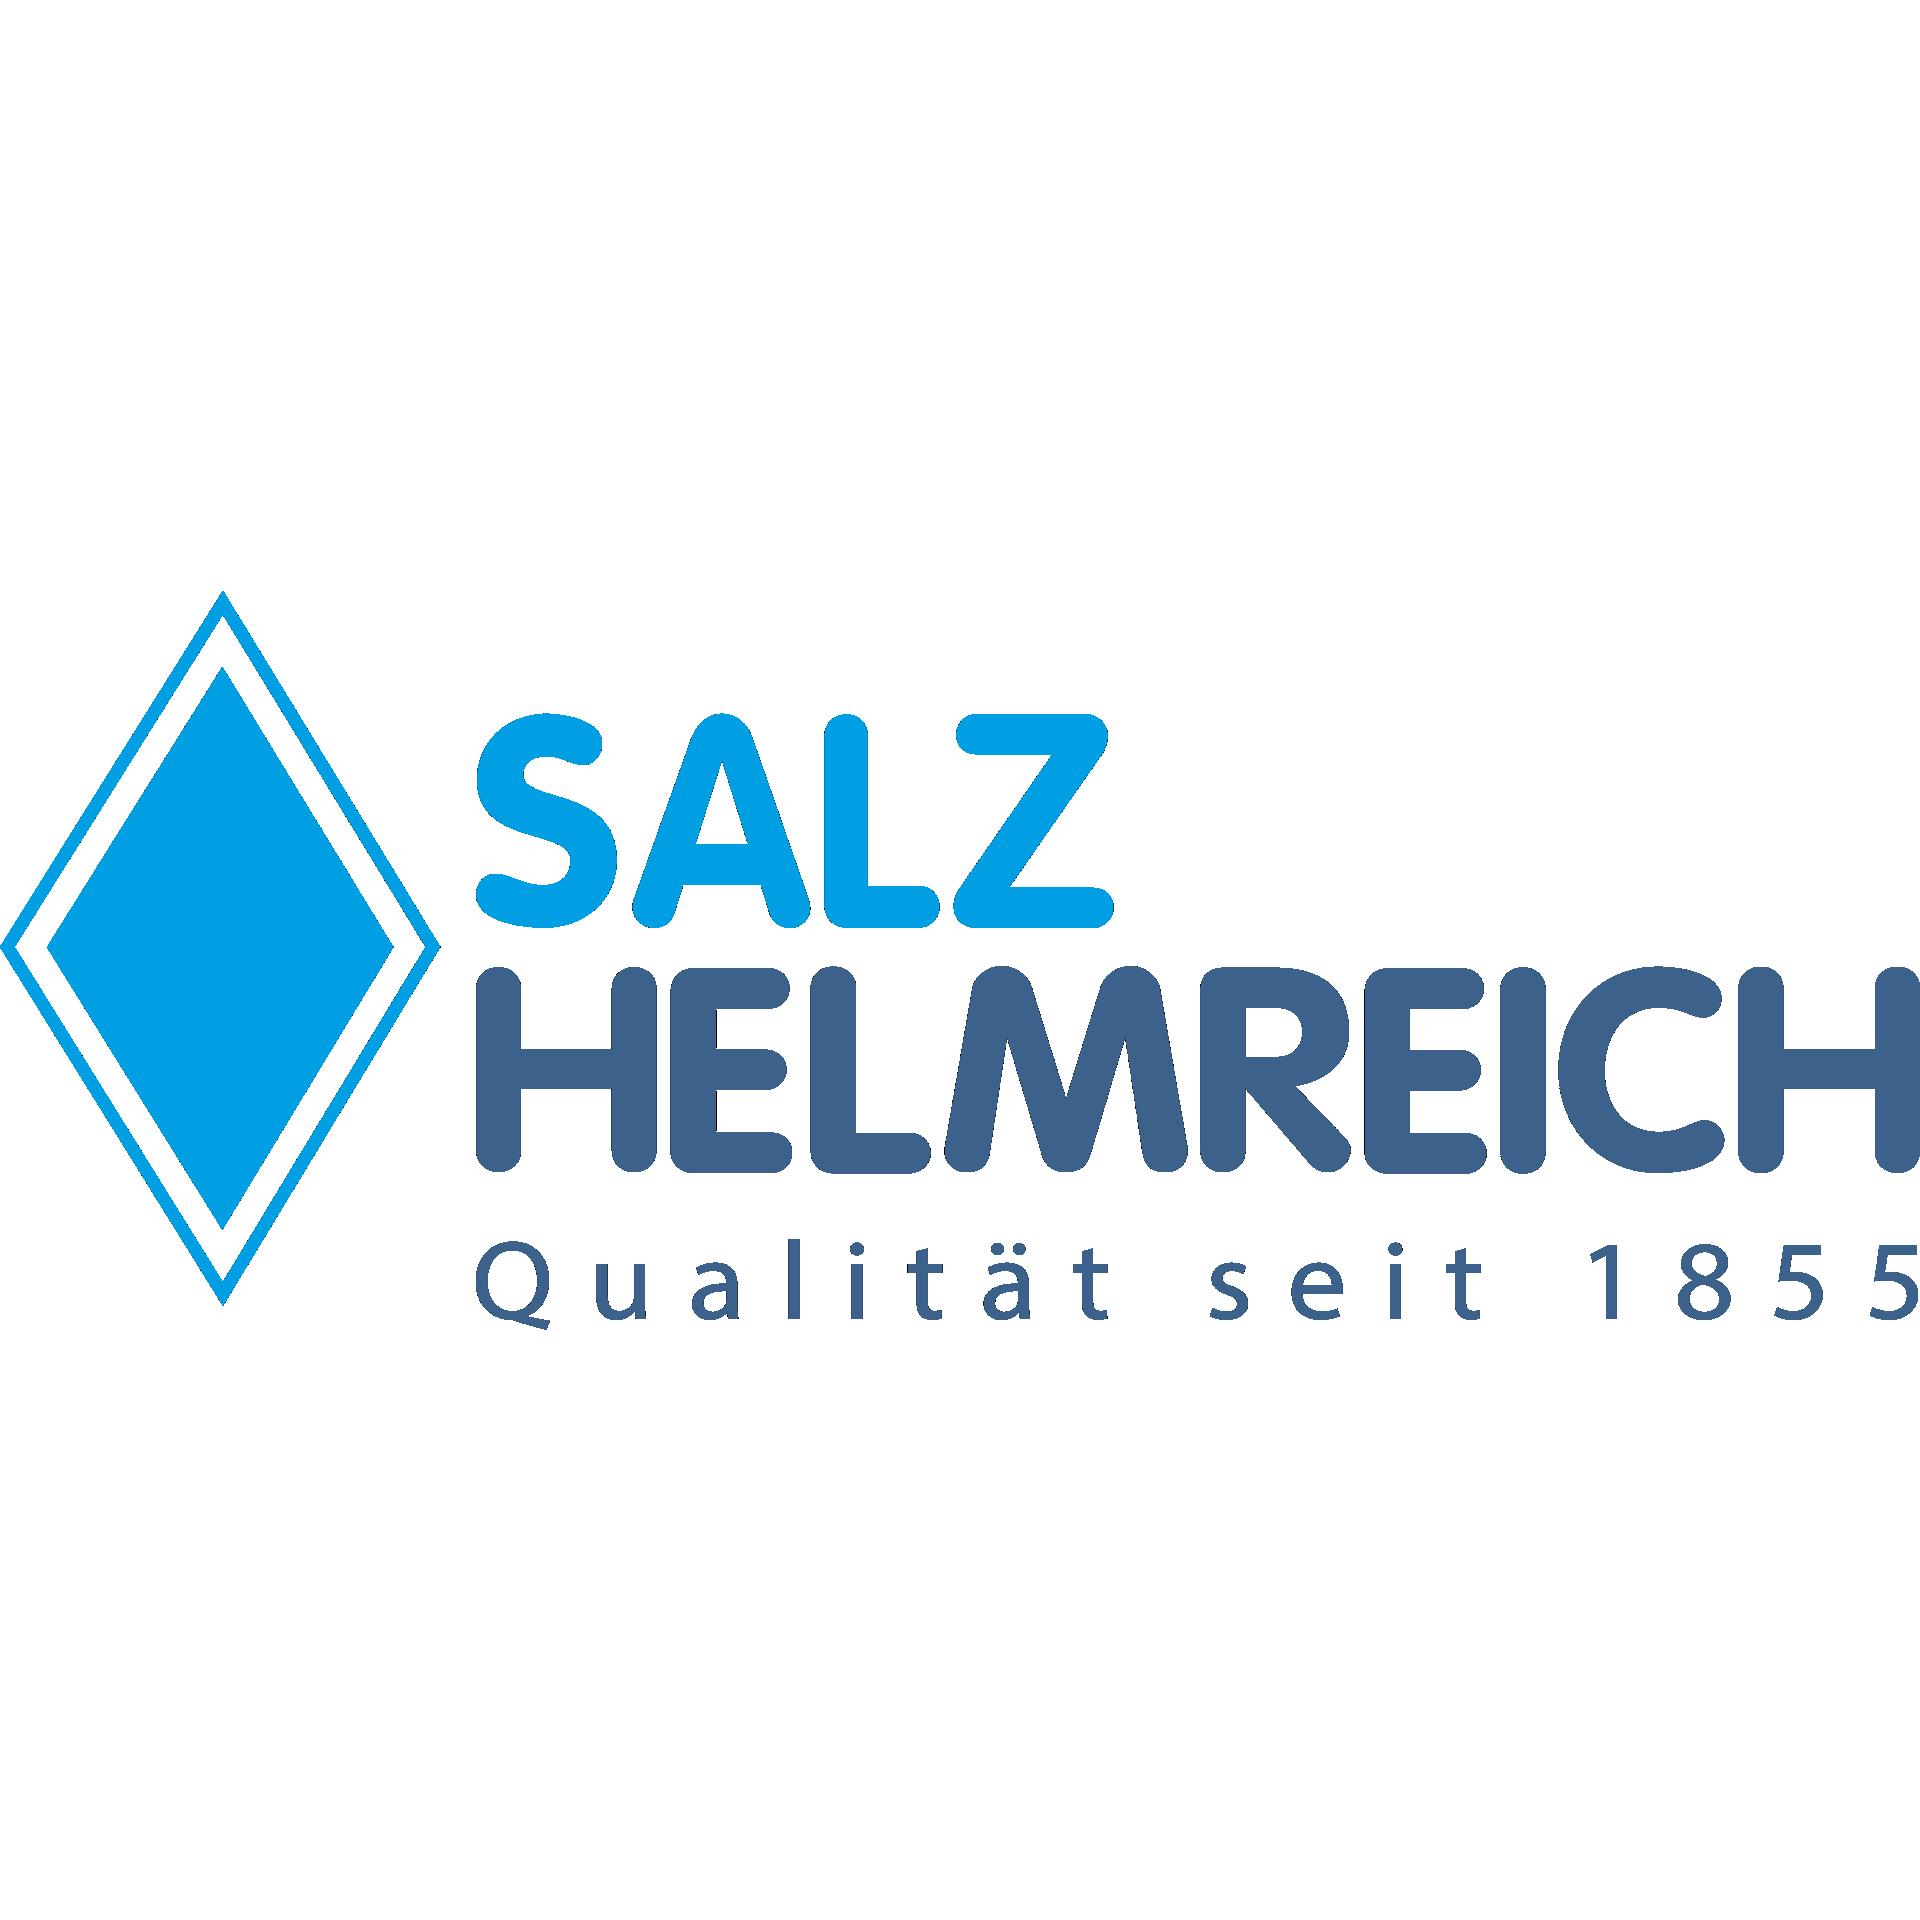 Alpensaline - Das Salz der Alpen Grobes Alpensalz 1 kg Paket